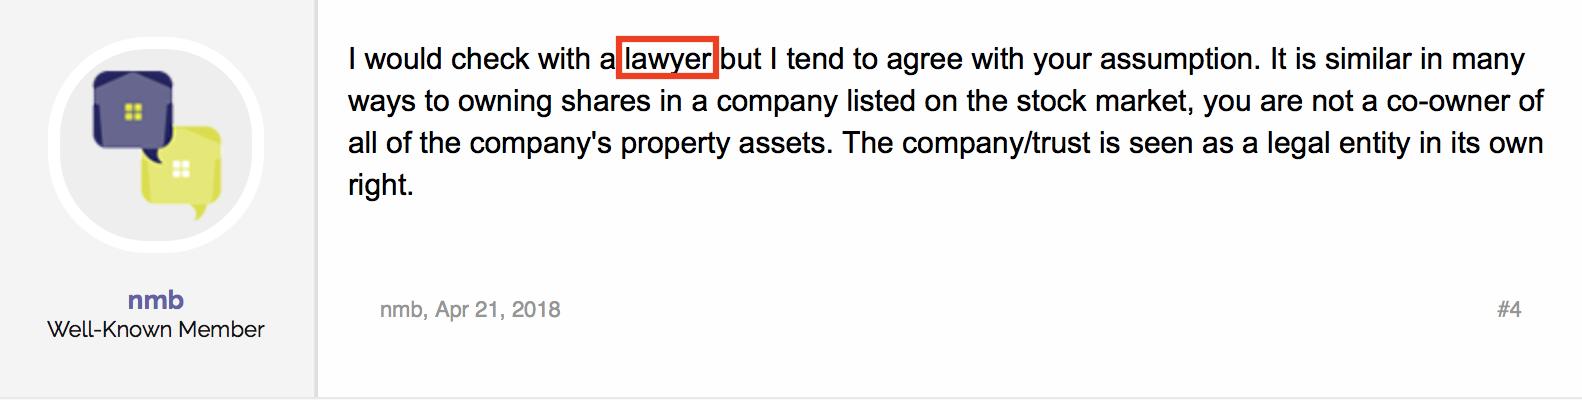 Lawyer keyword example 1